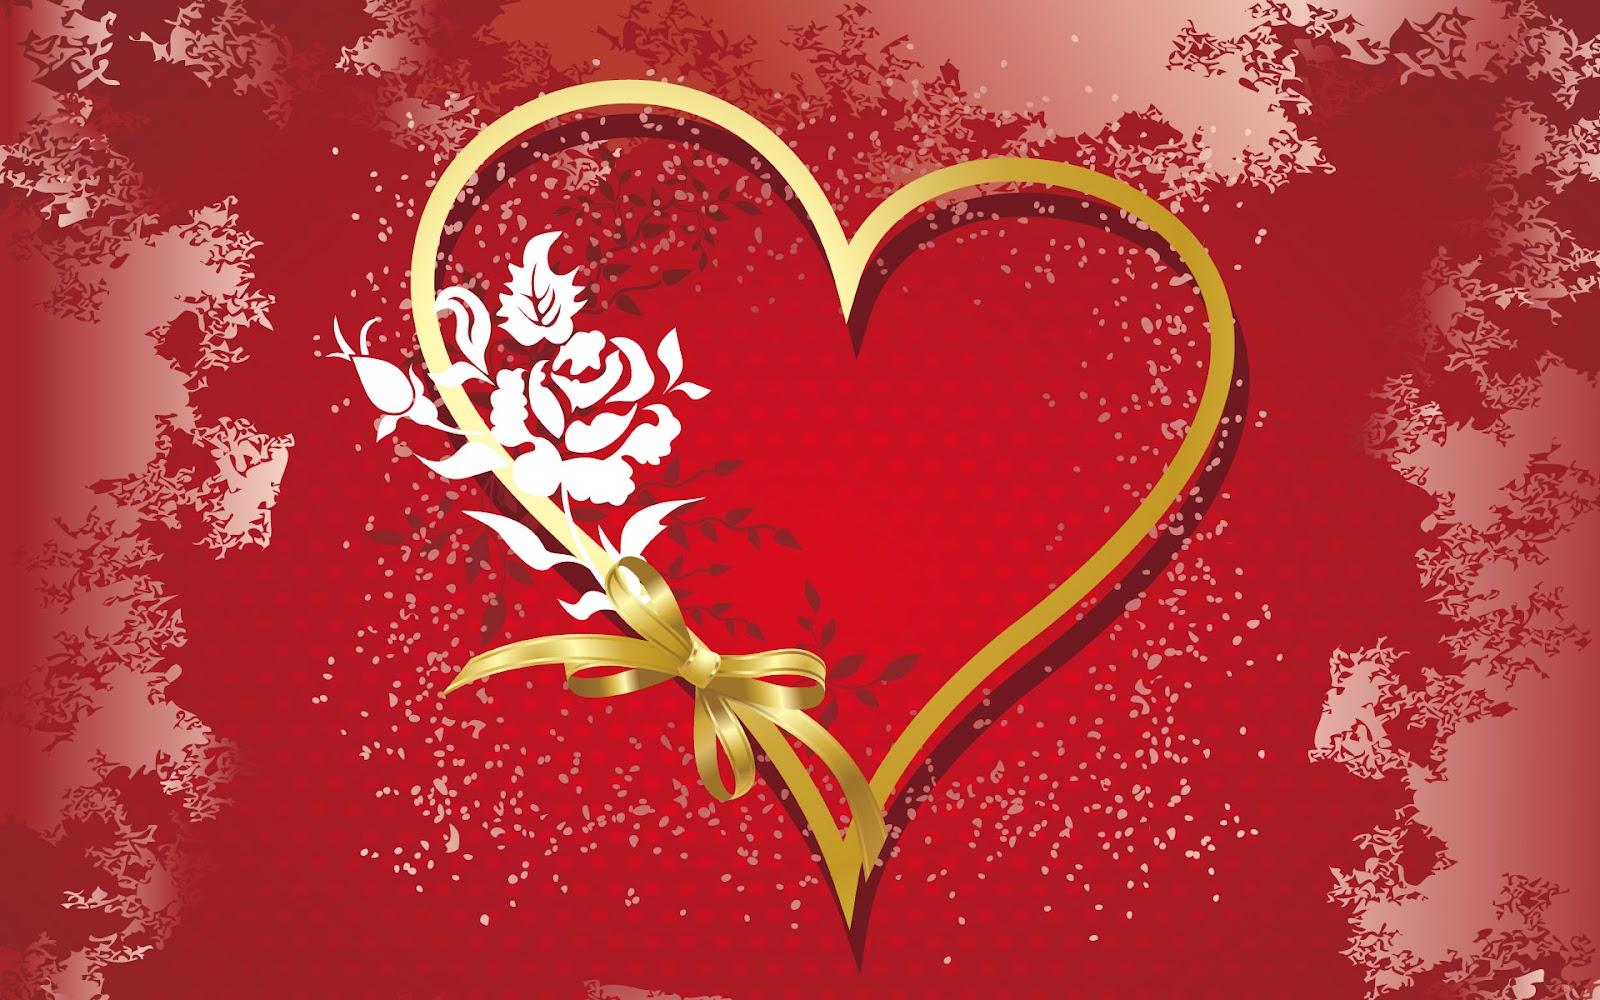 http://3.bp.blogspot.com/-TkmiZWwLMQI/UBKeibUkltI/AAAAAAAABGQ/4EpEiYSAq3k/s1600/heart-wallpaper+%25282%2529.jpg